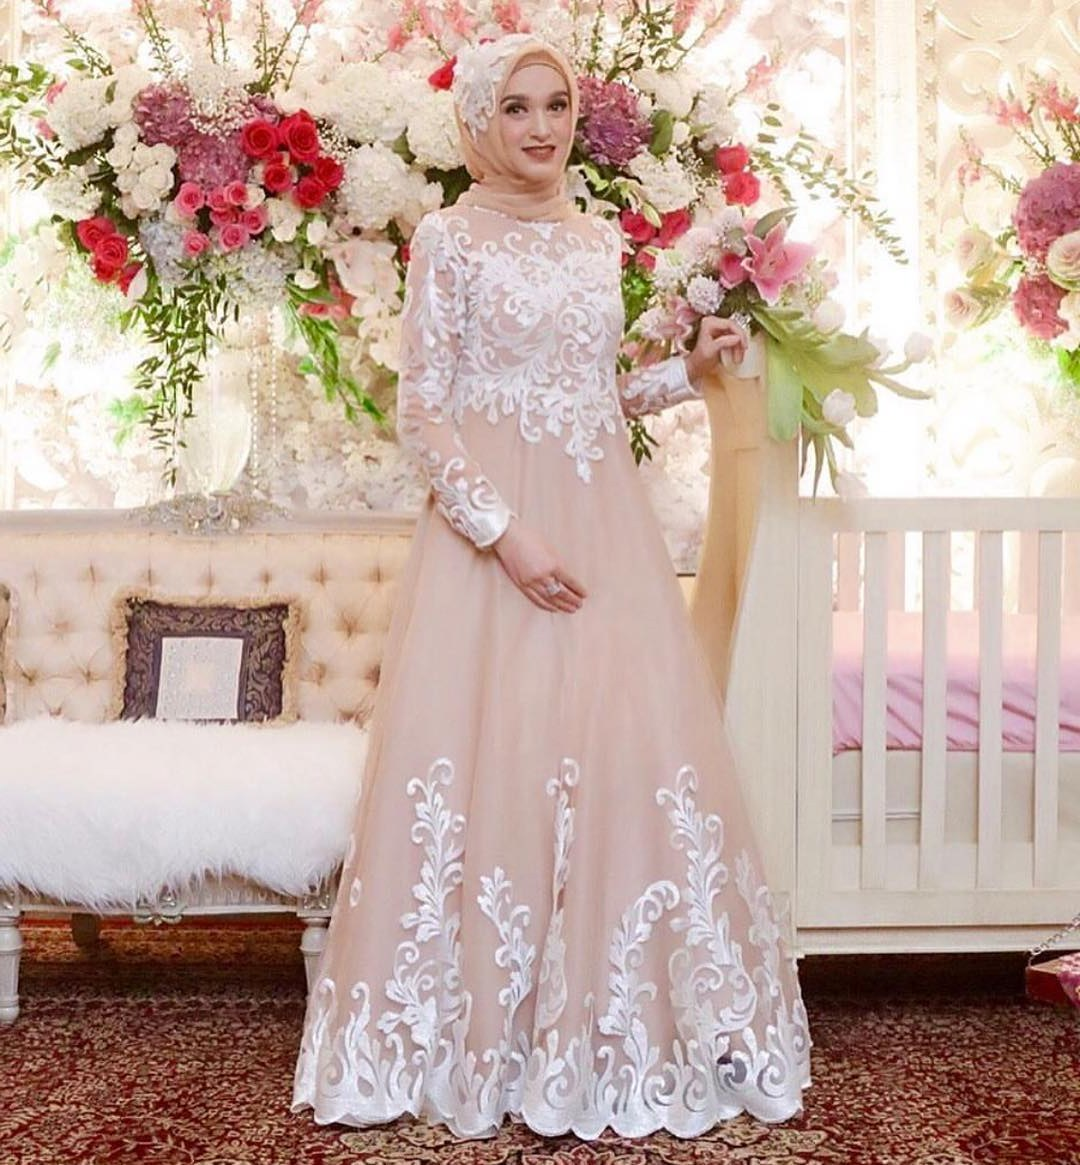 Bentuk Harga Gaun Pengantin Muslimah Syar'i Rldj 17 Model Baju Pengantin Muslim 2018 Desain Elegan Cantik